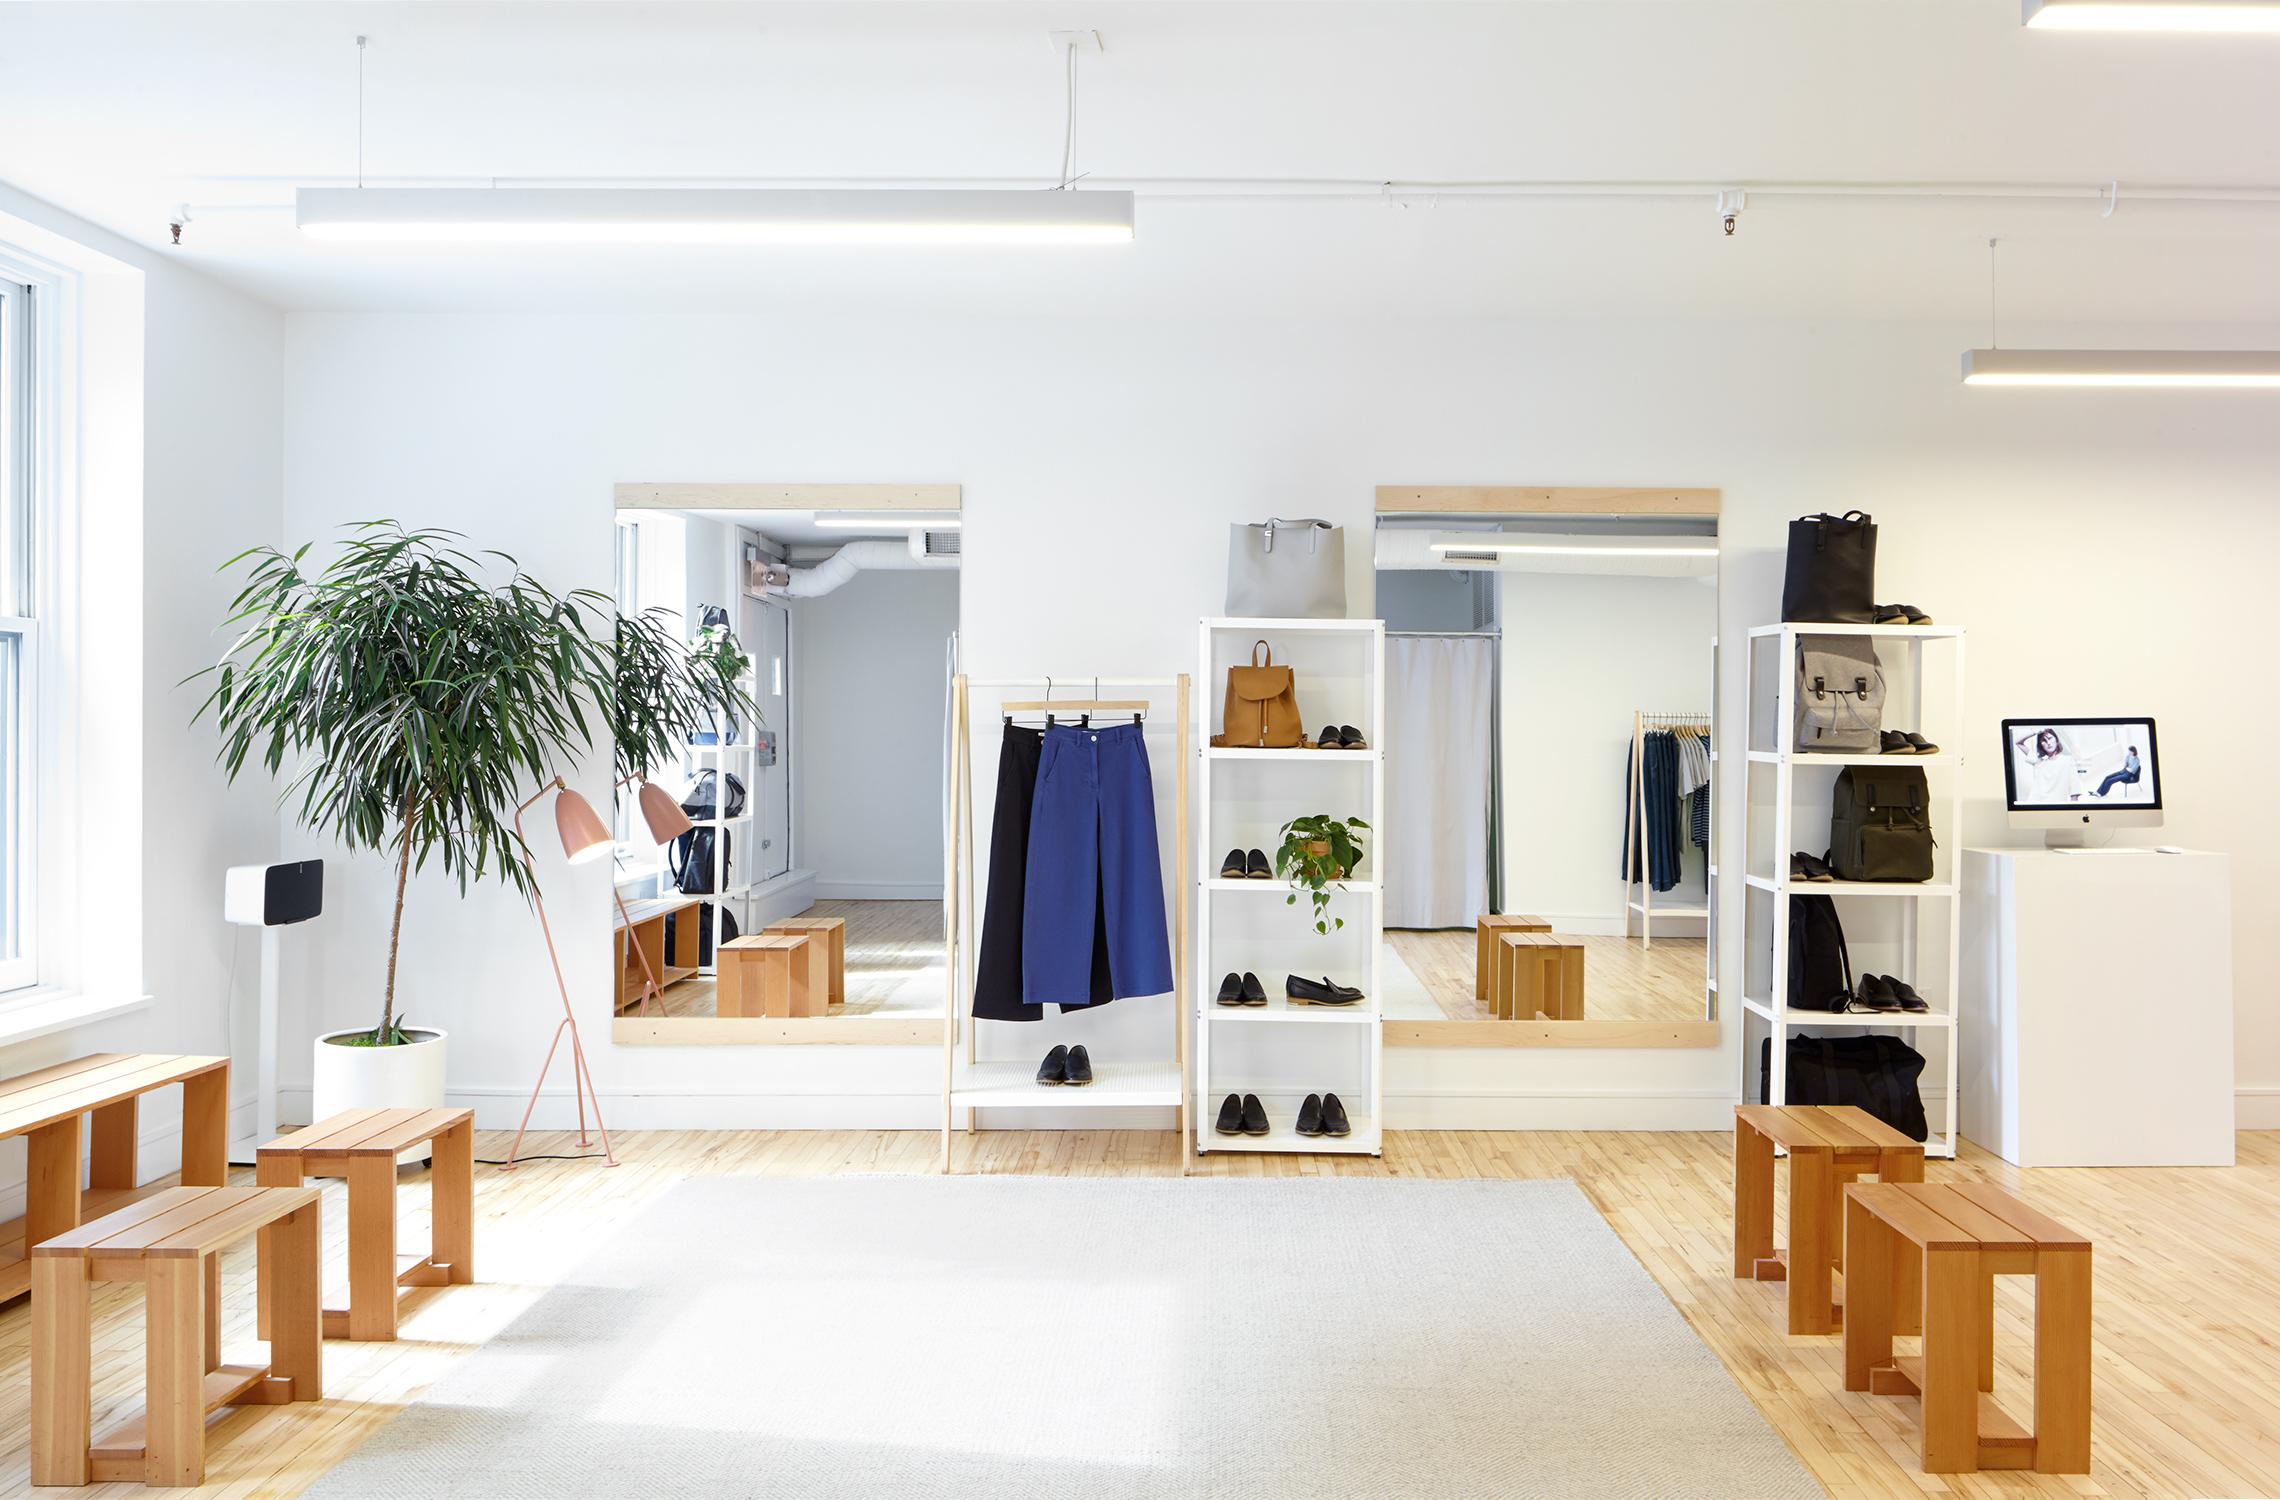 170315-gcano-everlane-showroom-ny-0014.jpg